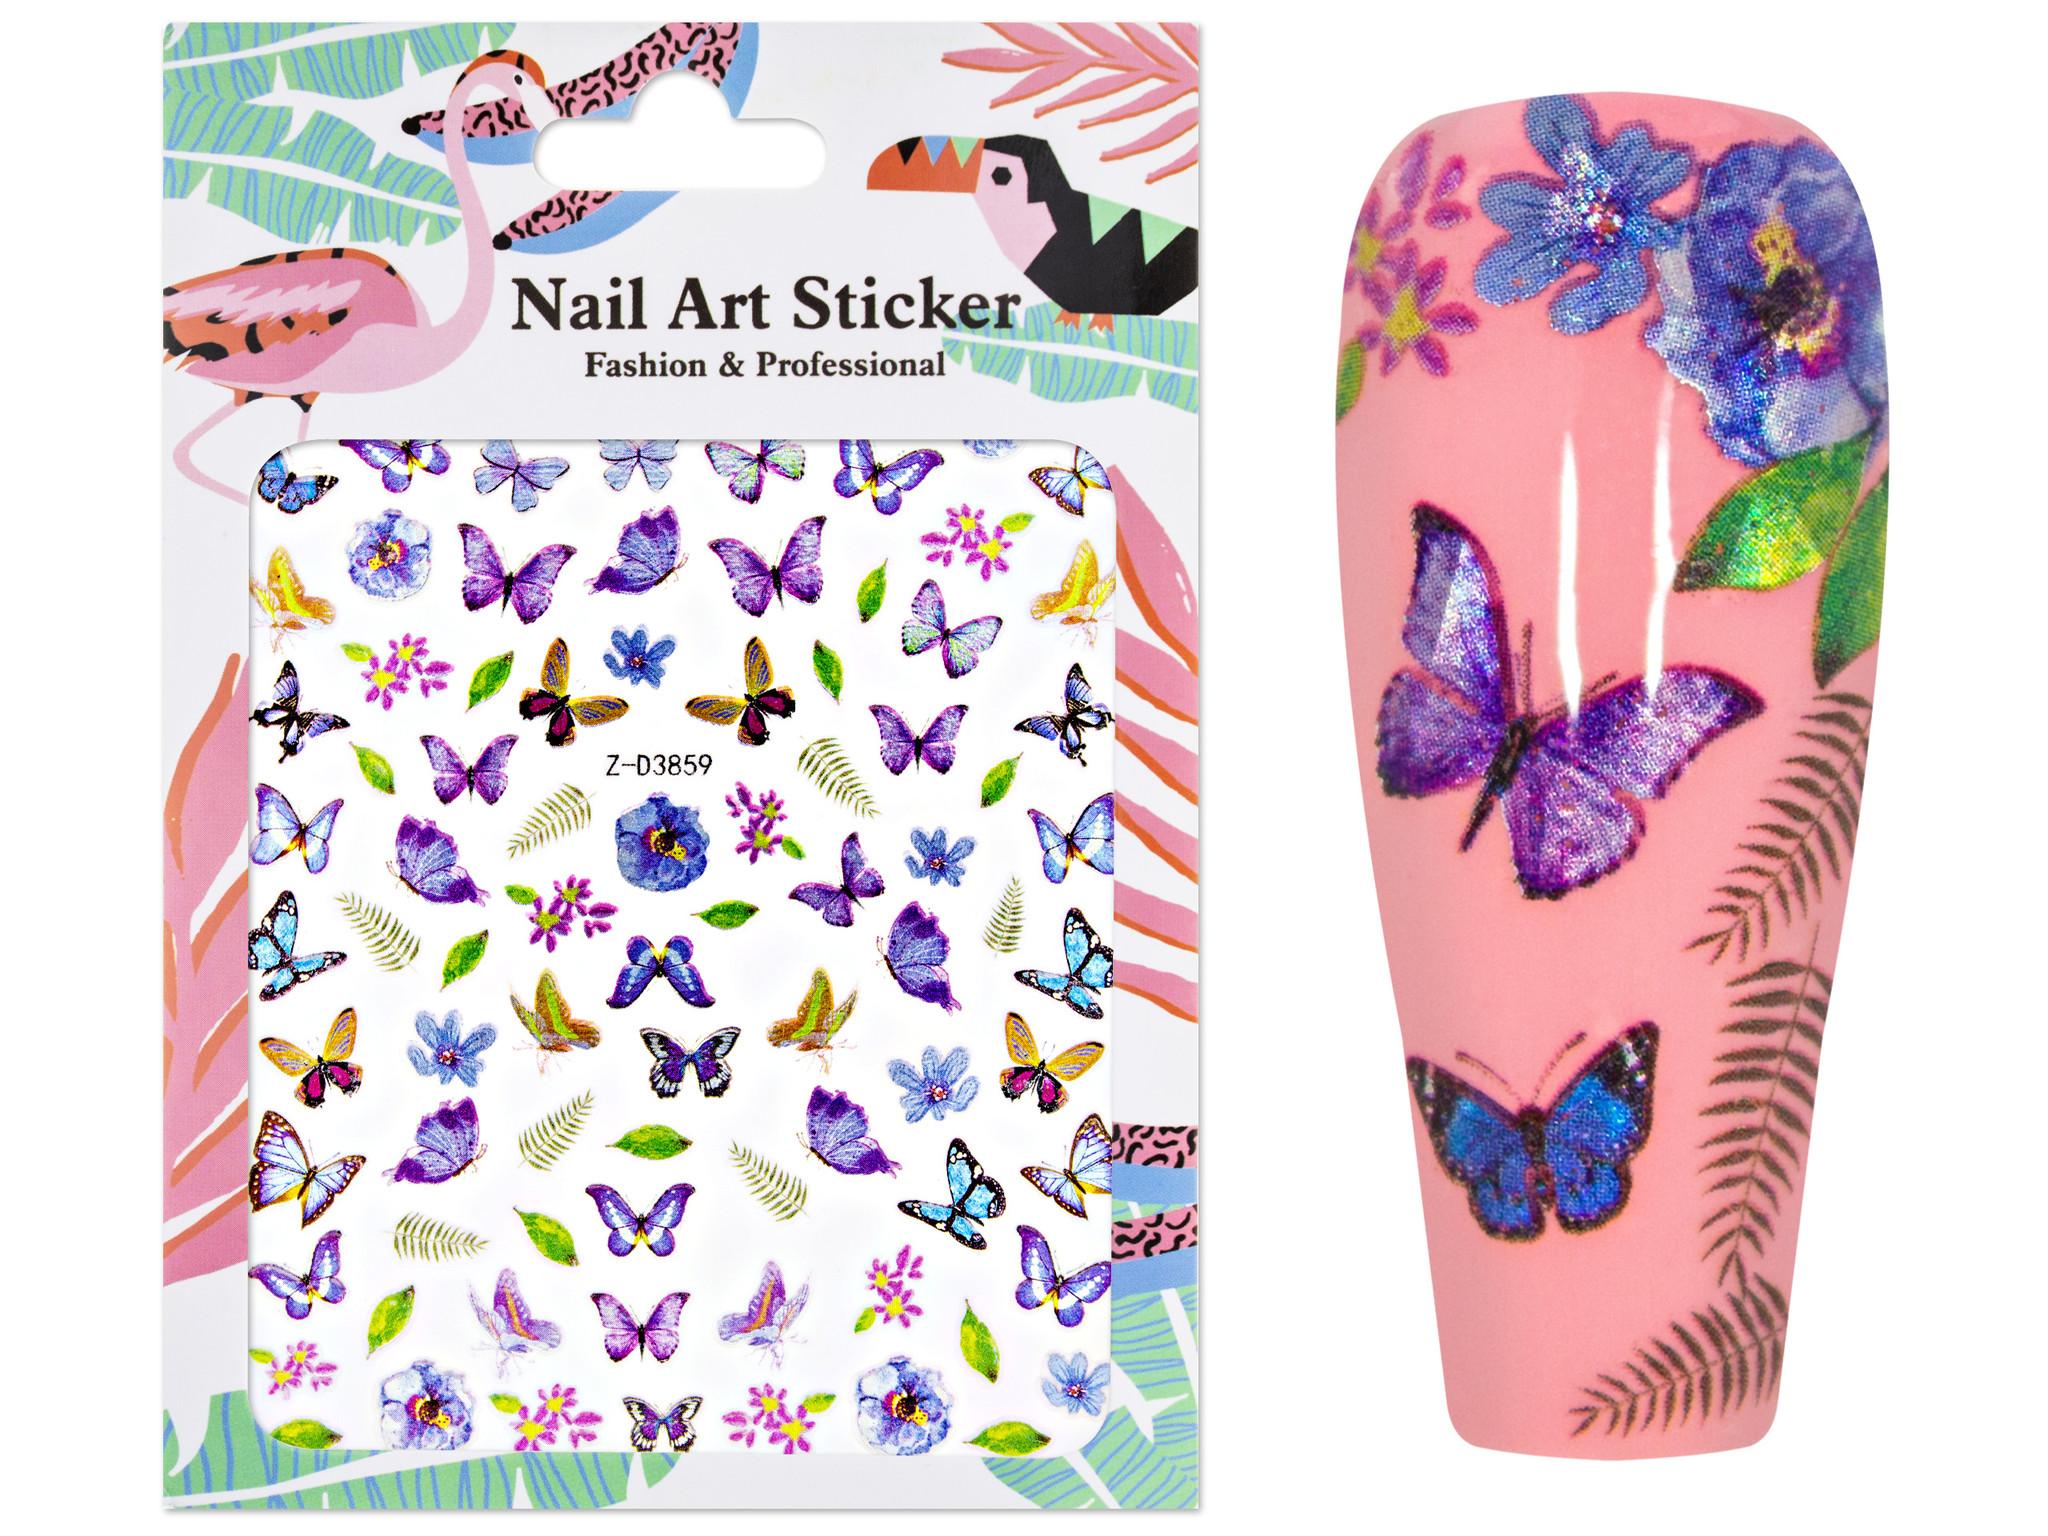 Netama's  Beauty Nail Art Sticker